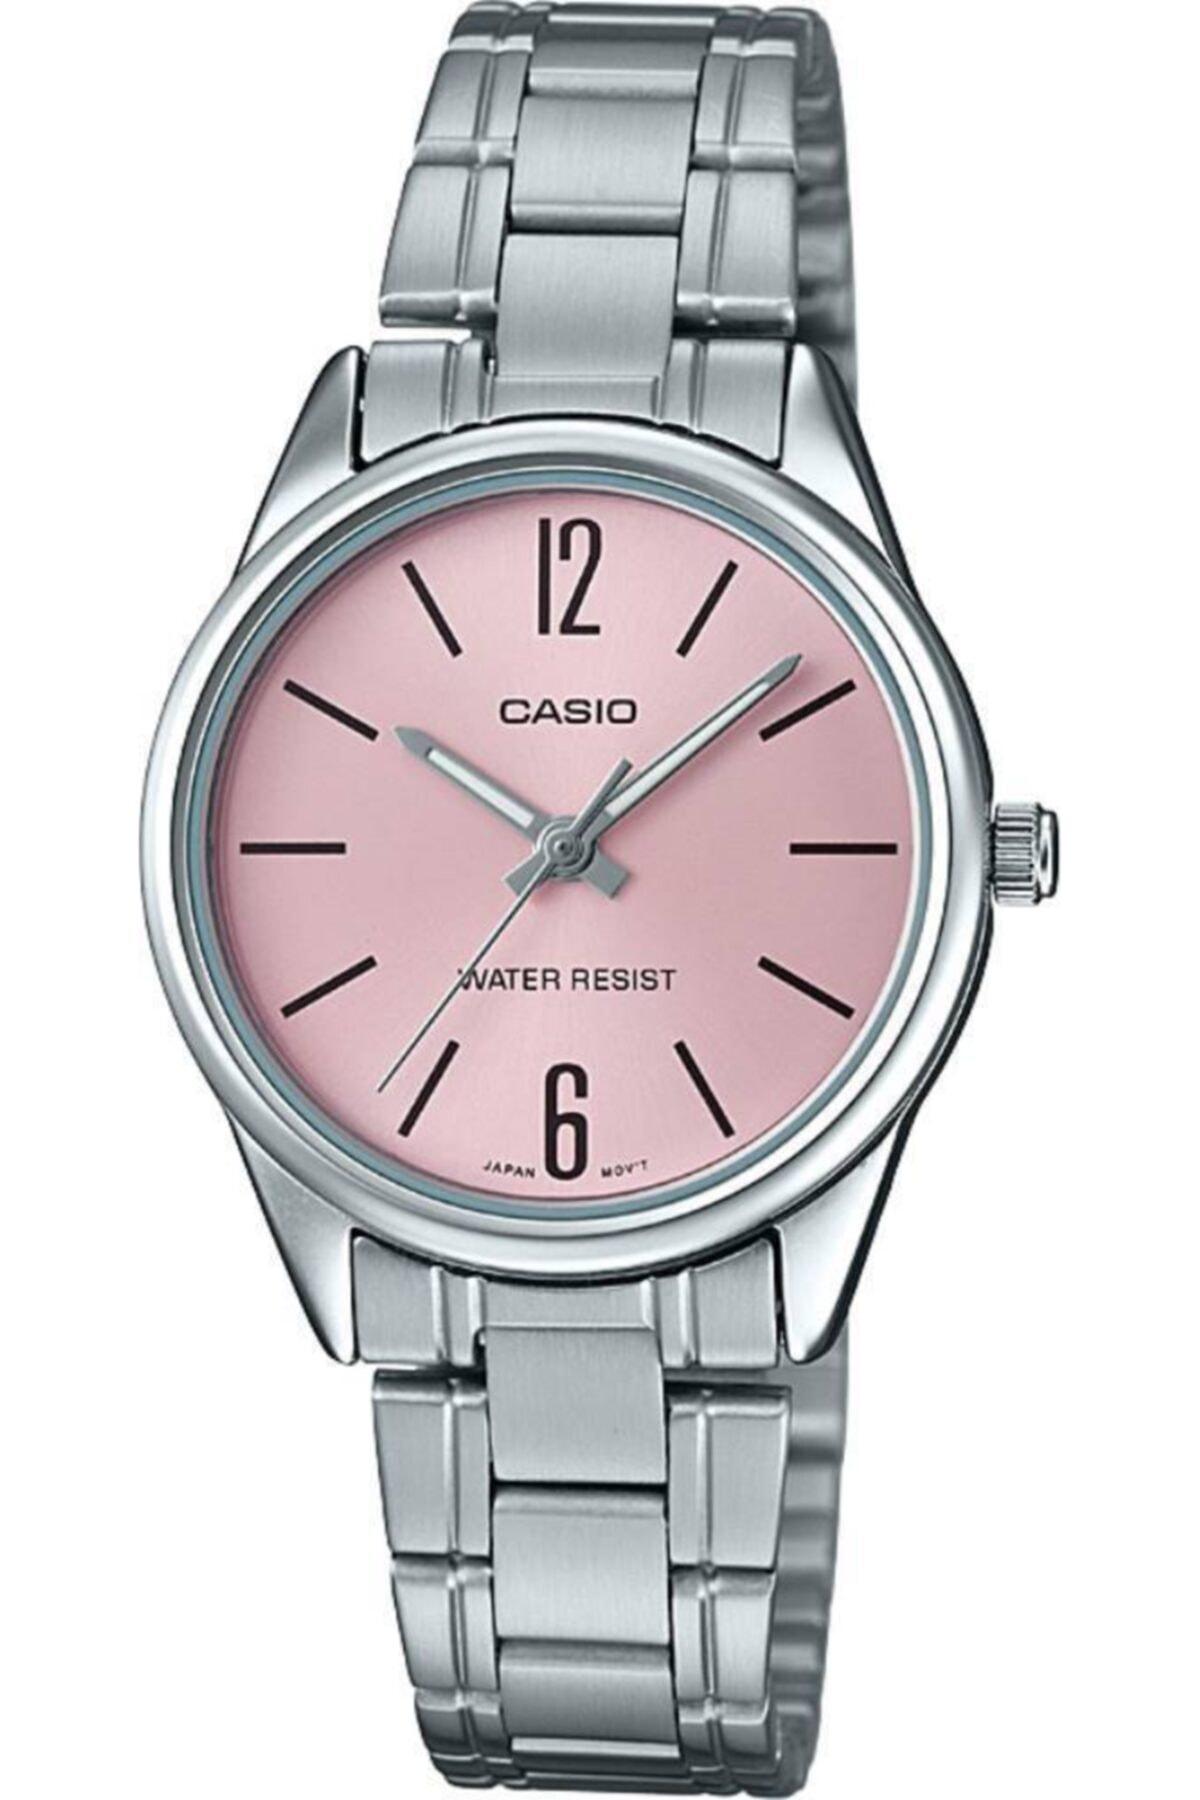 Casio Ltp-v005d-4budf Bayan Kol Saati 1